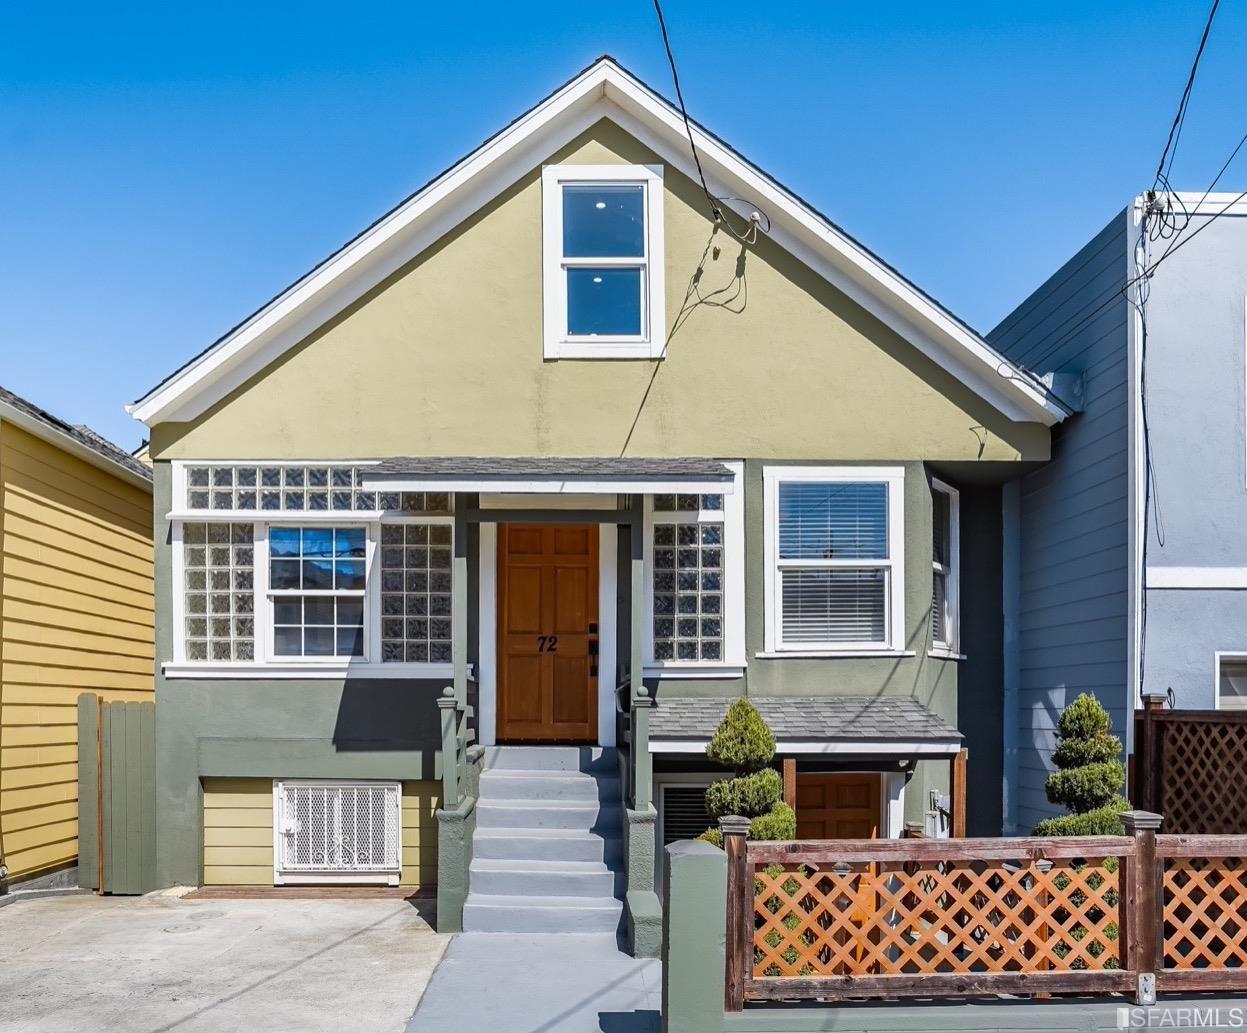 72 Bruce Avenue, San Francisco, CA 94112 - #: 421532458